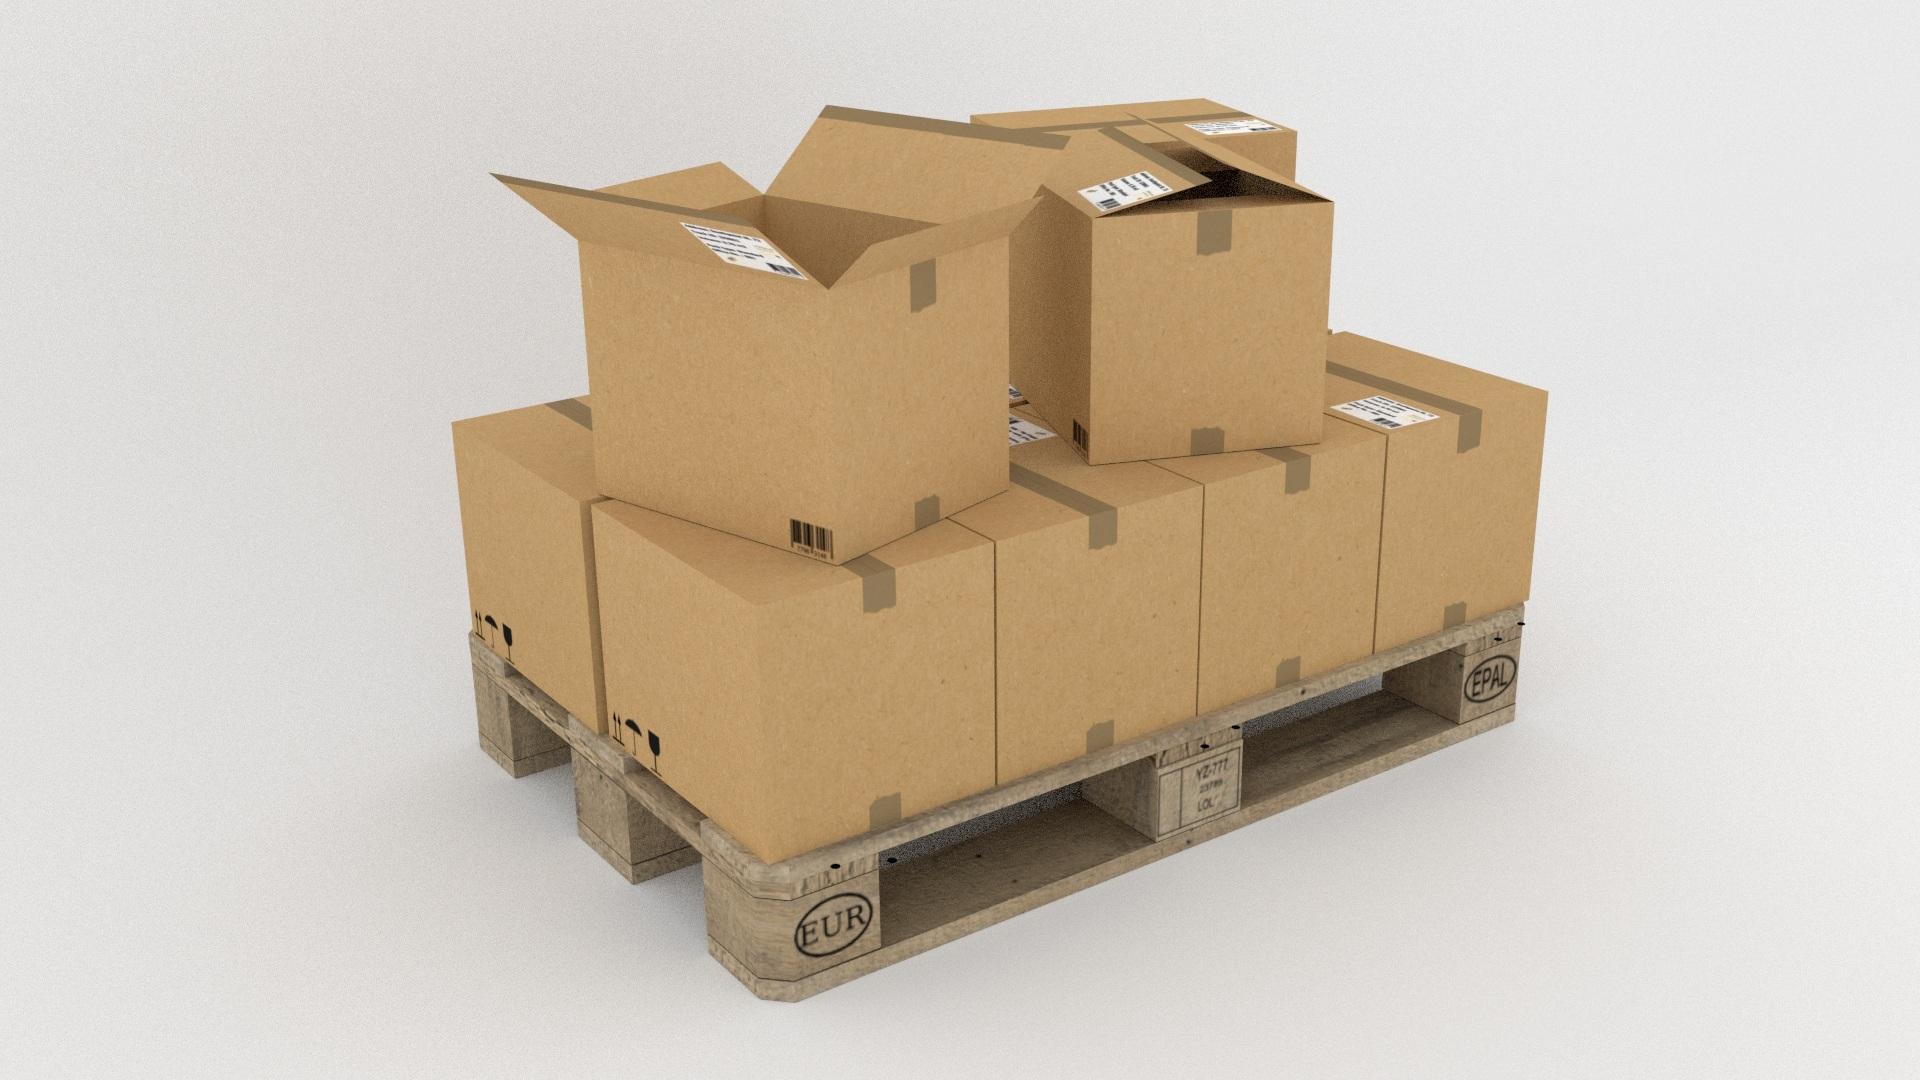 Fotos gratis madera transporte producto expedici n - Cajas para fotografos ...